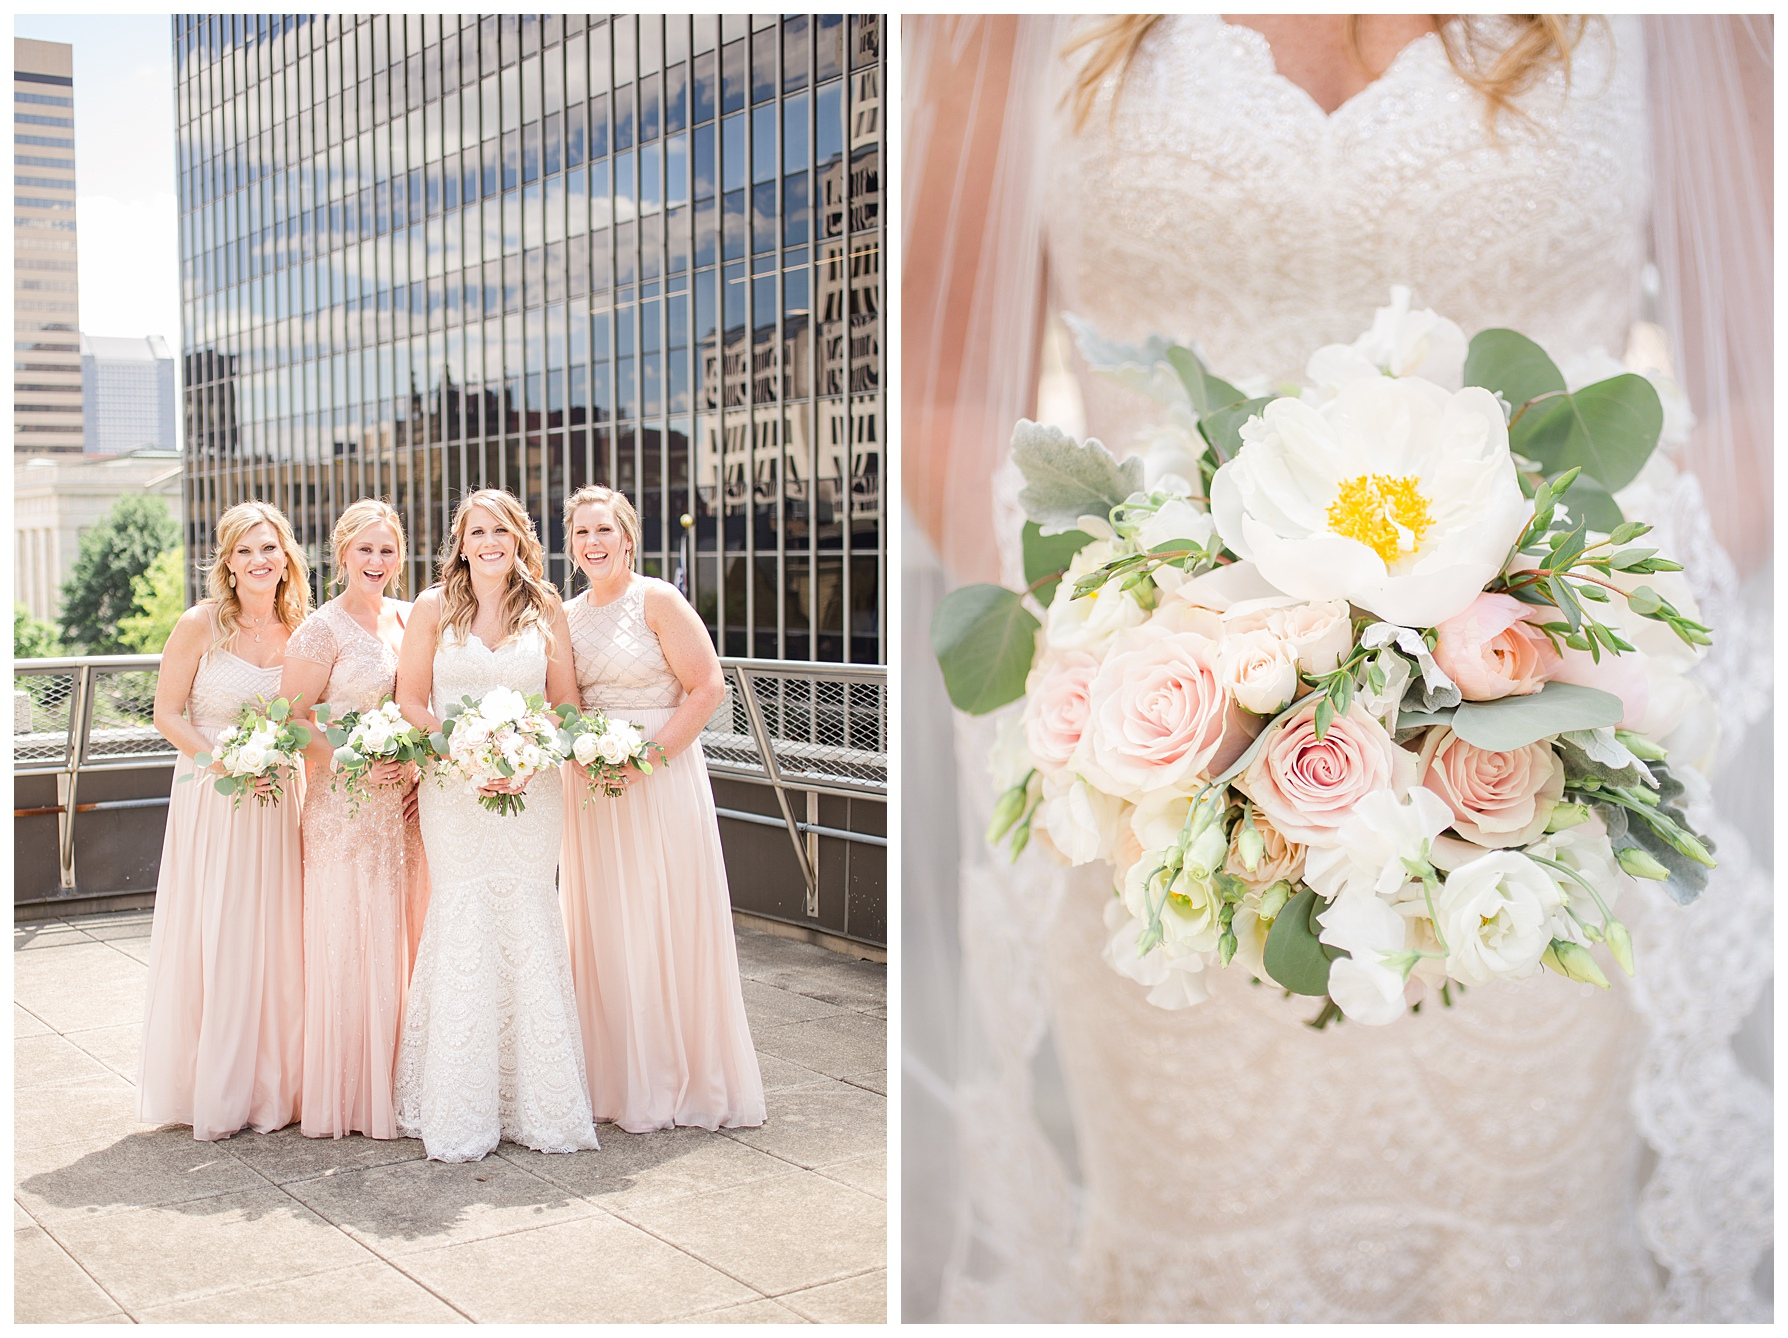 columbus-wedding-bridesmaids-flowers_0019.jpg